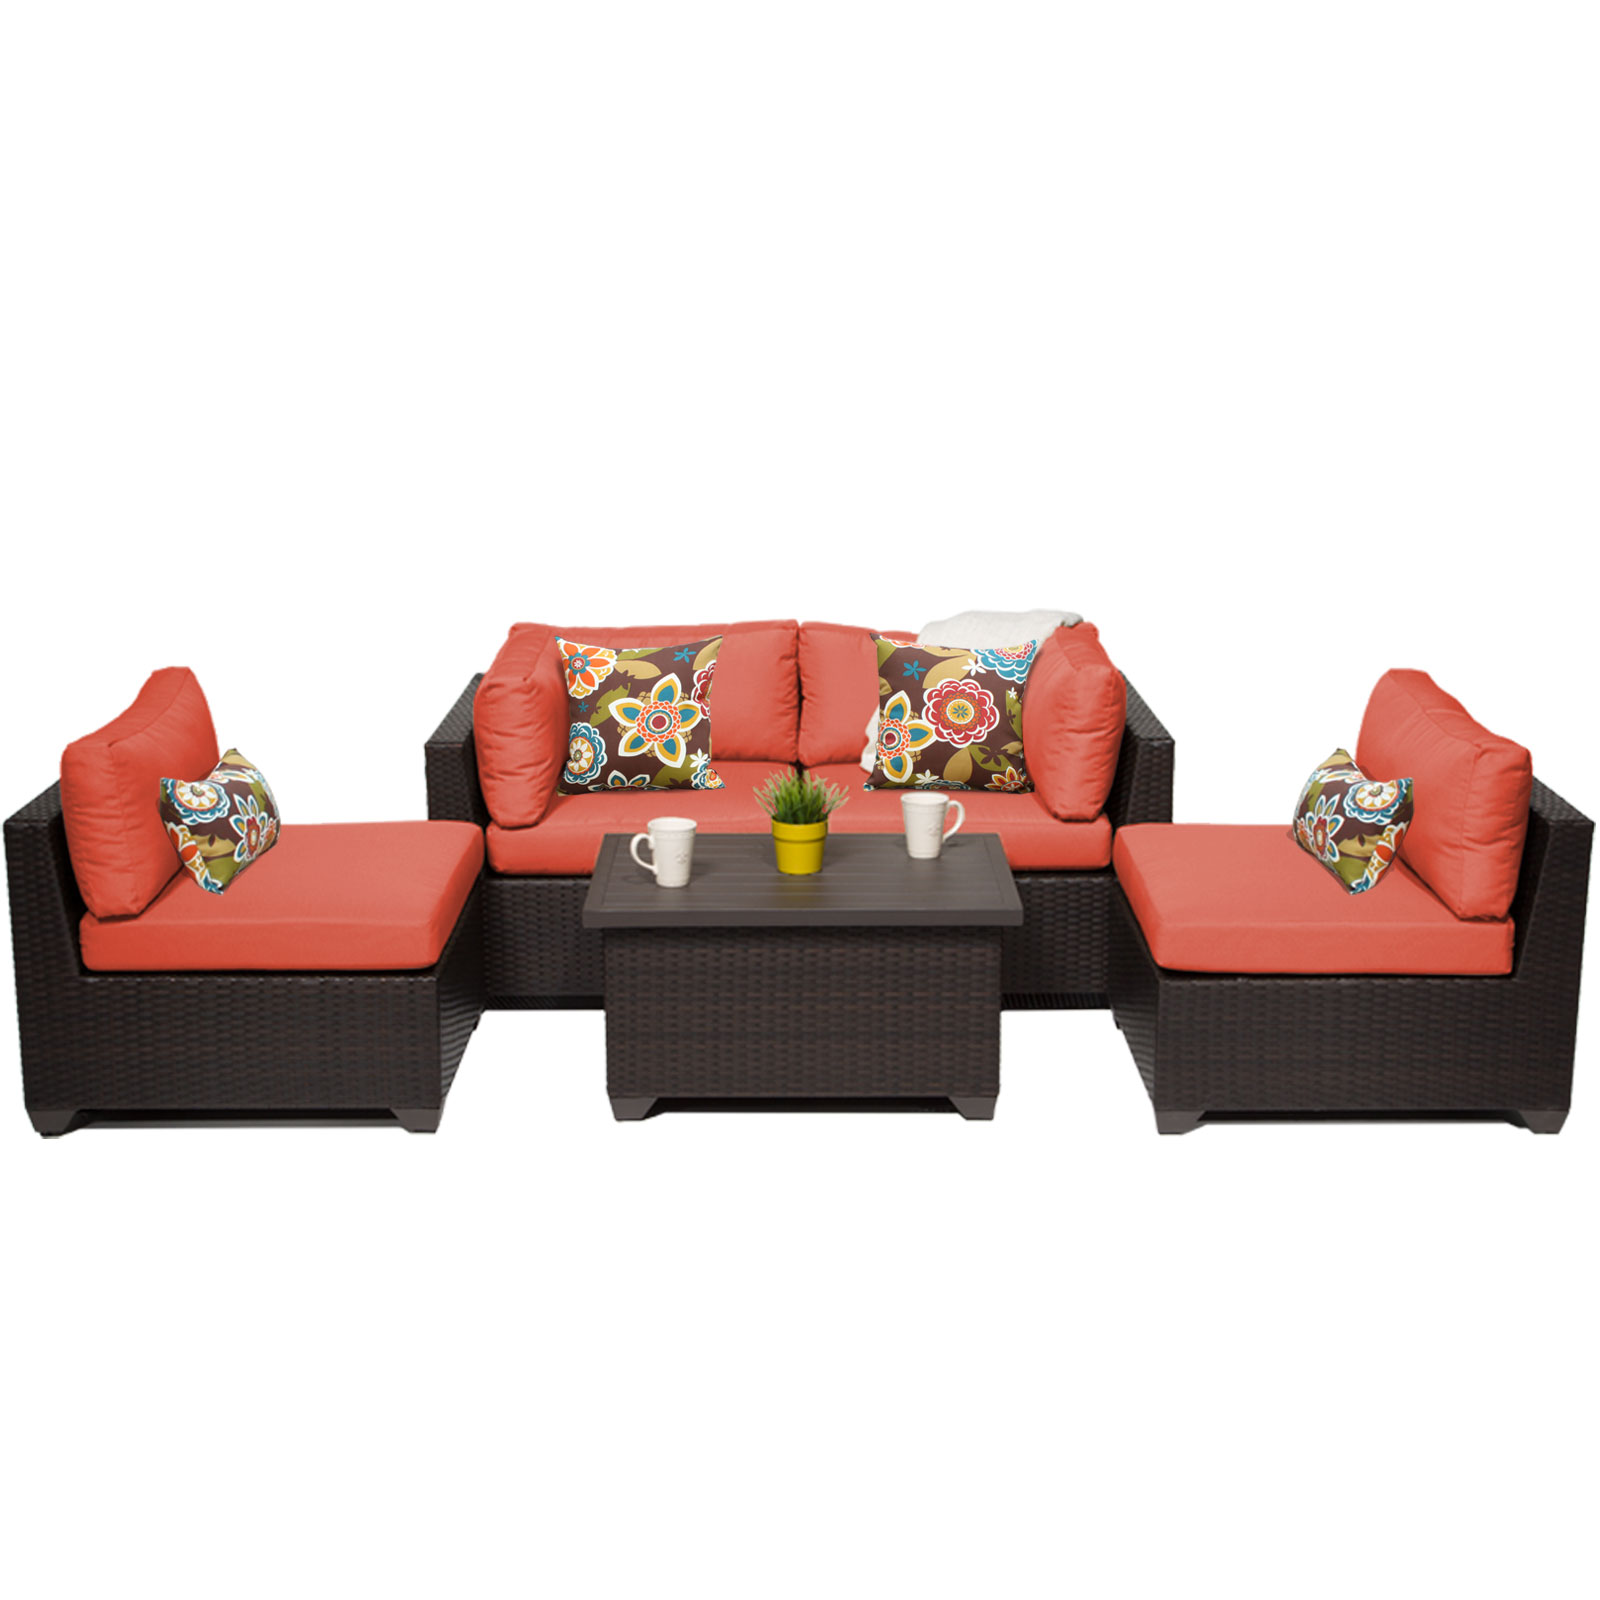 Premier 5 Piece Outdoor Wicker Patio Furniture Set 05c